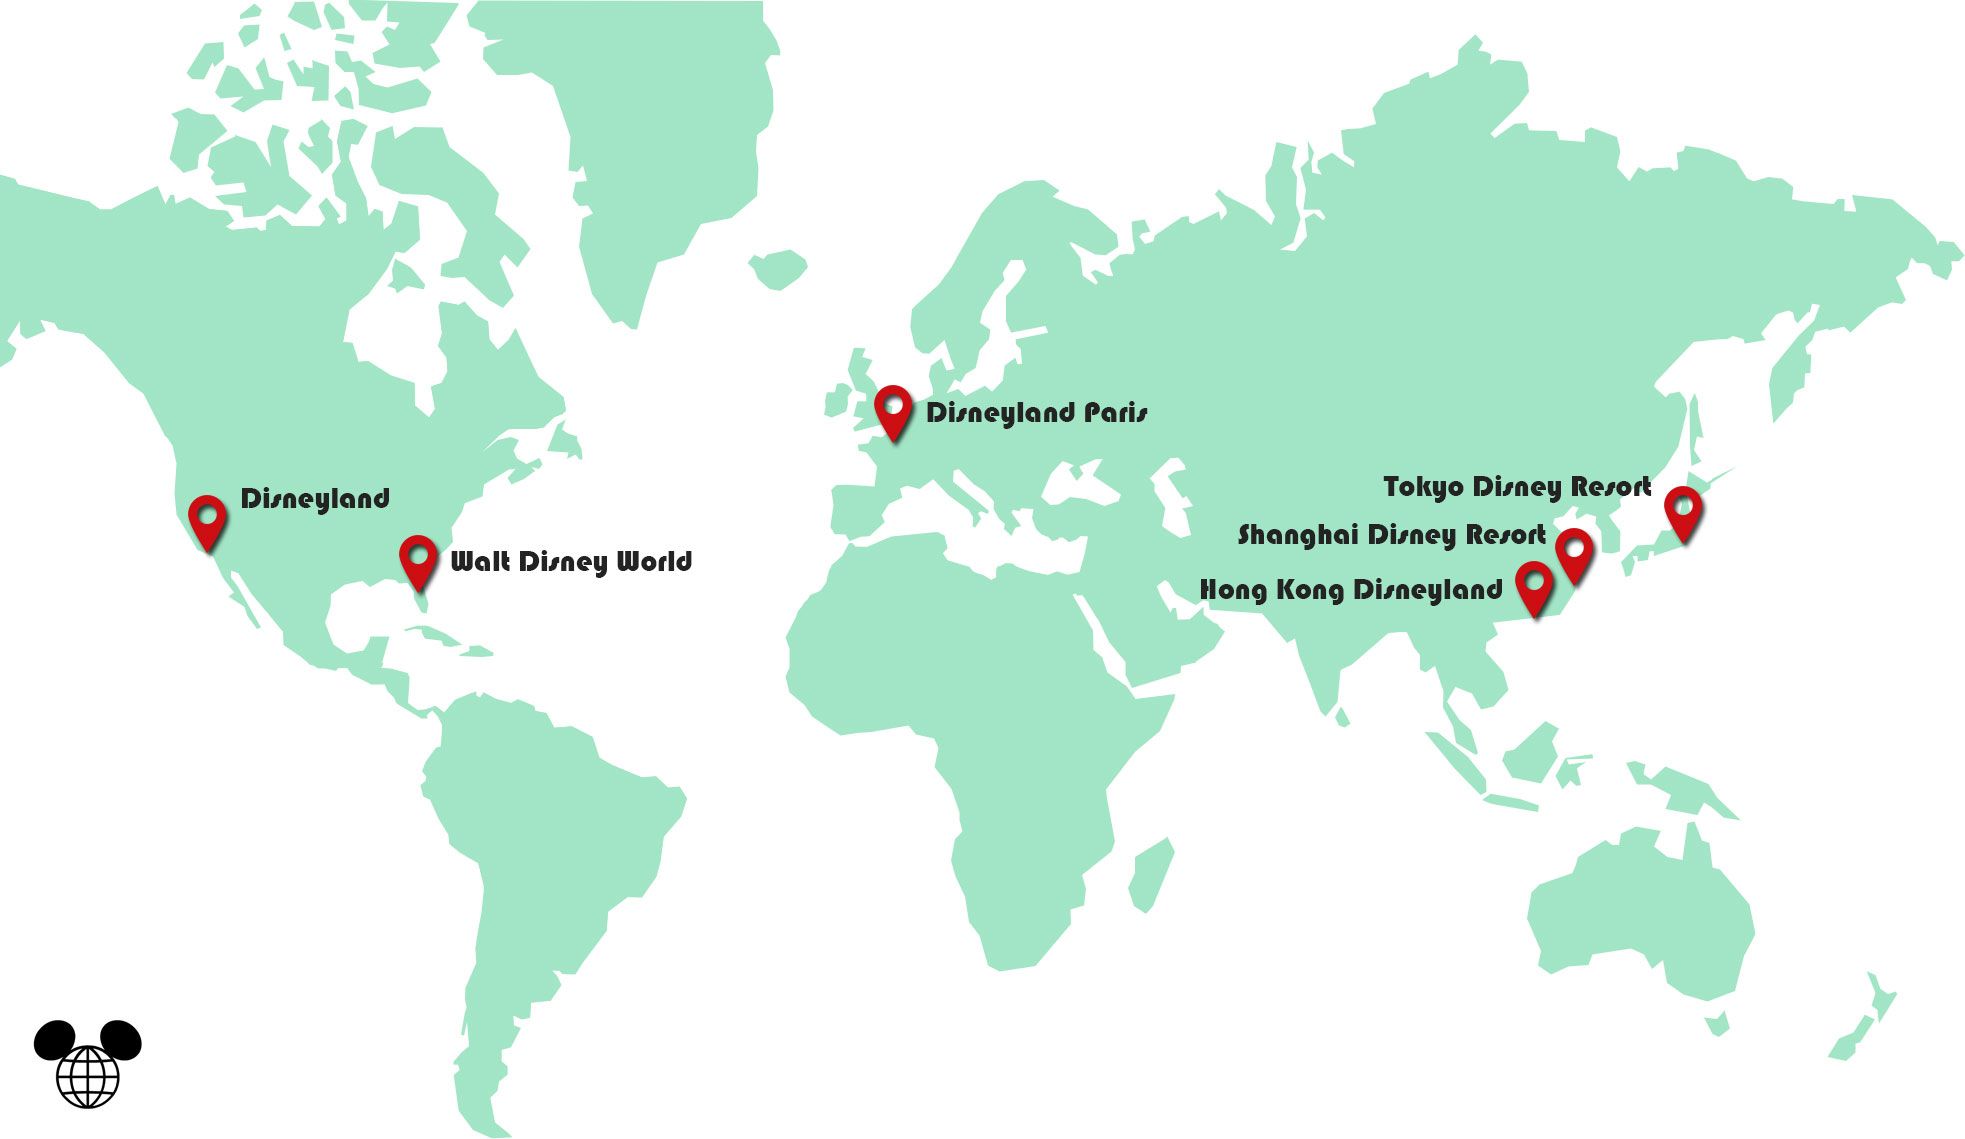 Carte Disneyland dans le monde